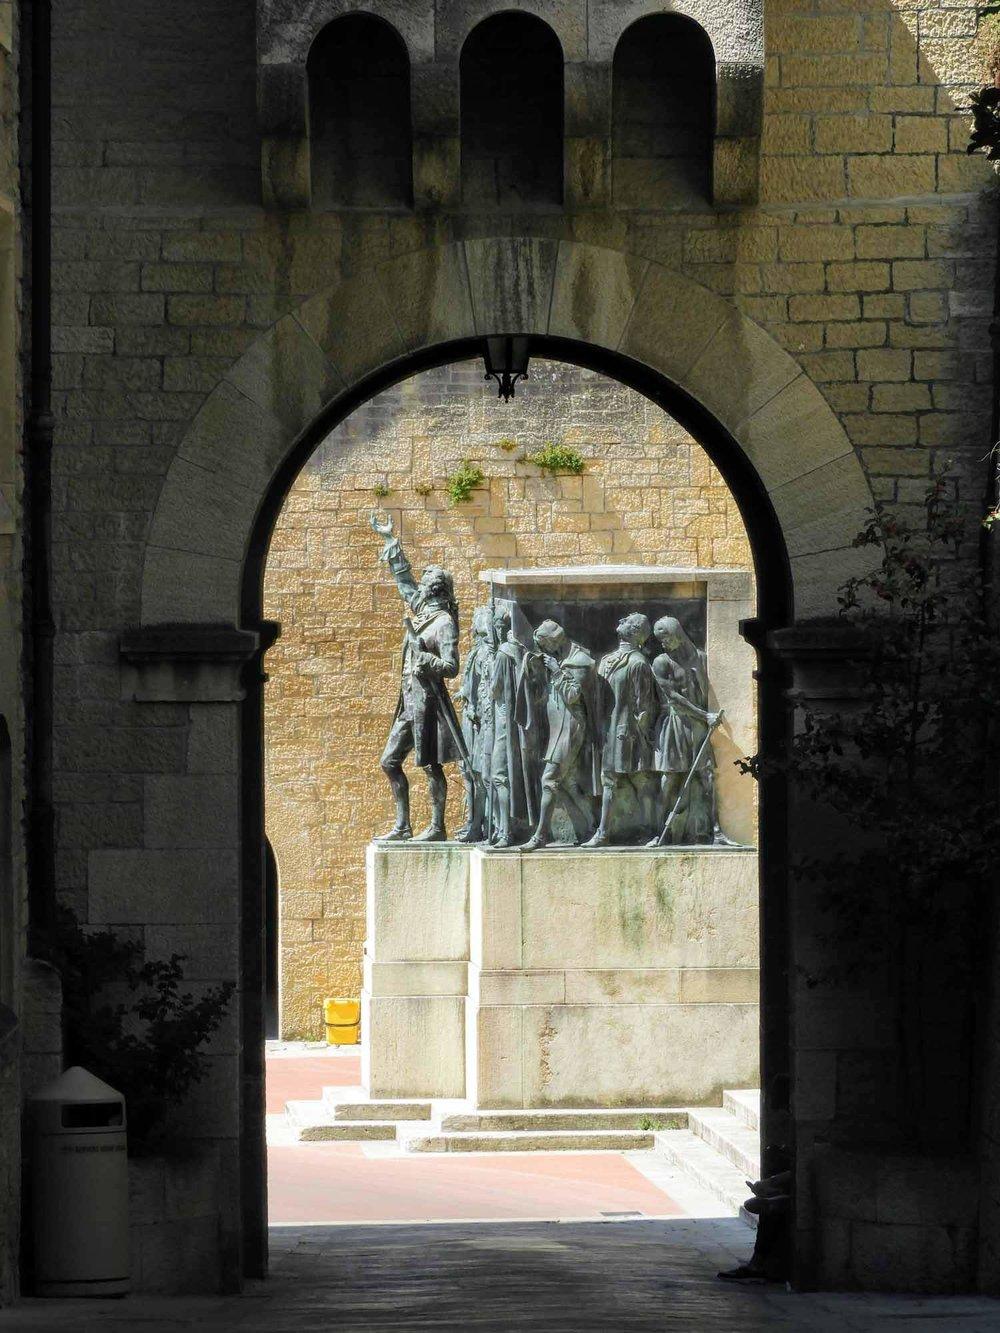 san-marino-micro-nation-ancient-wall-portal-doorway-statue.jpg